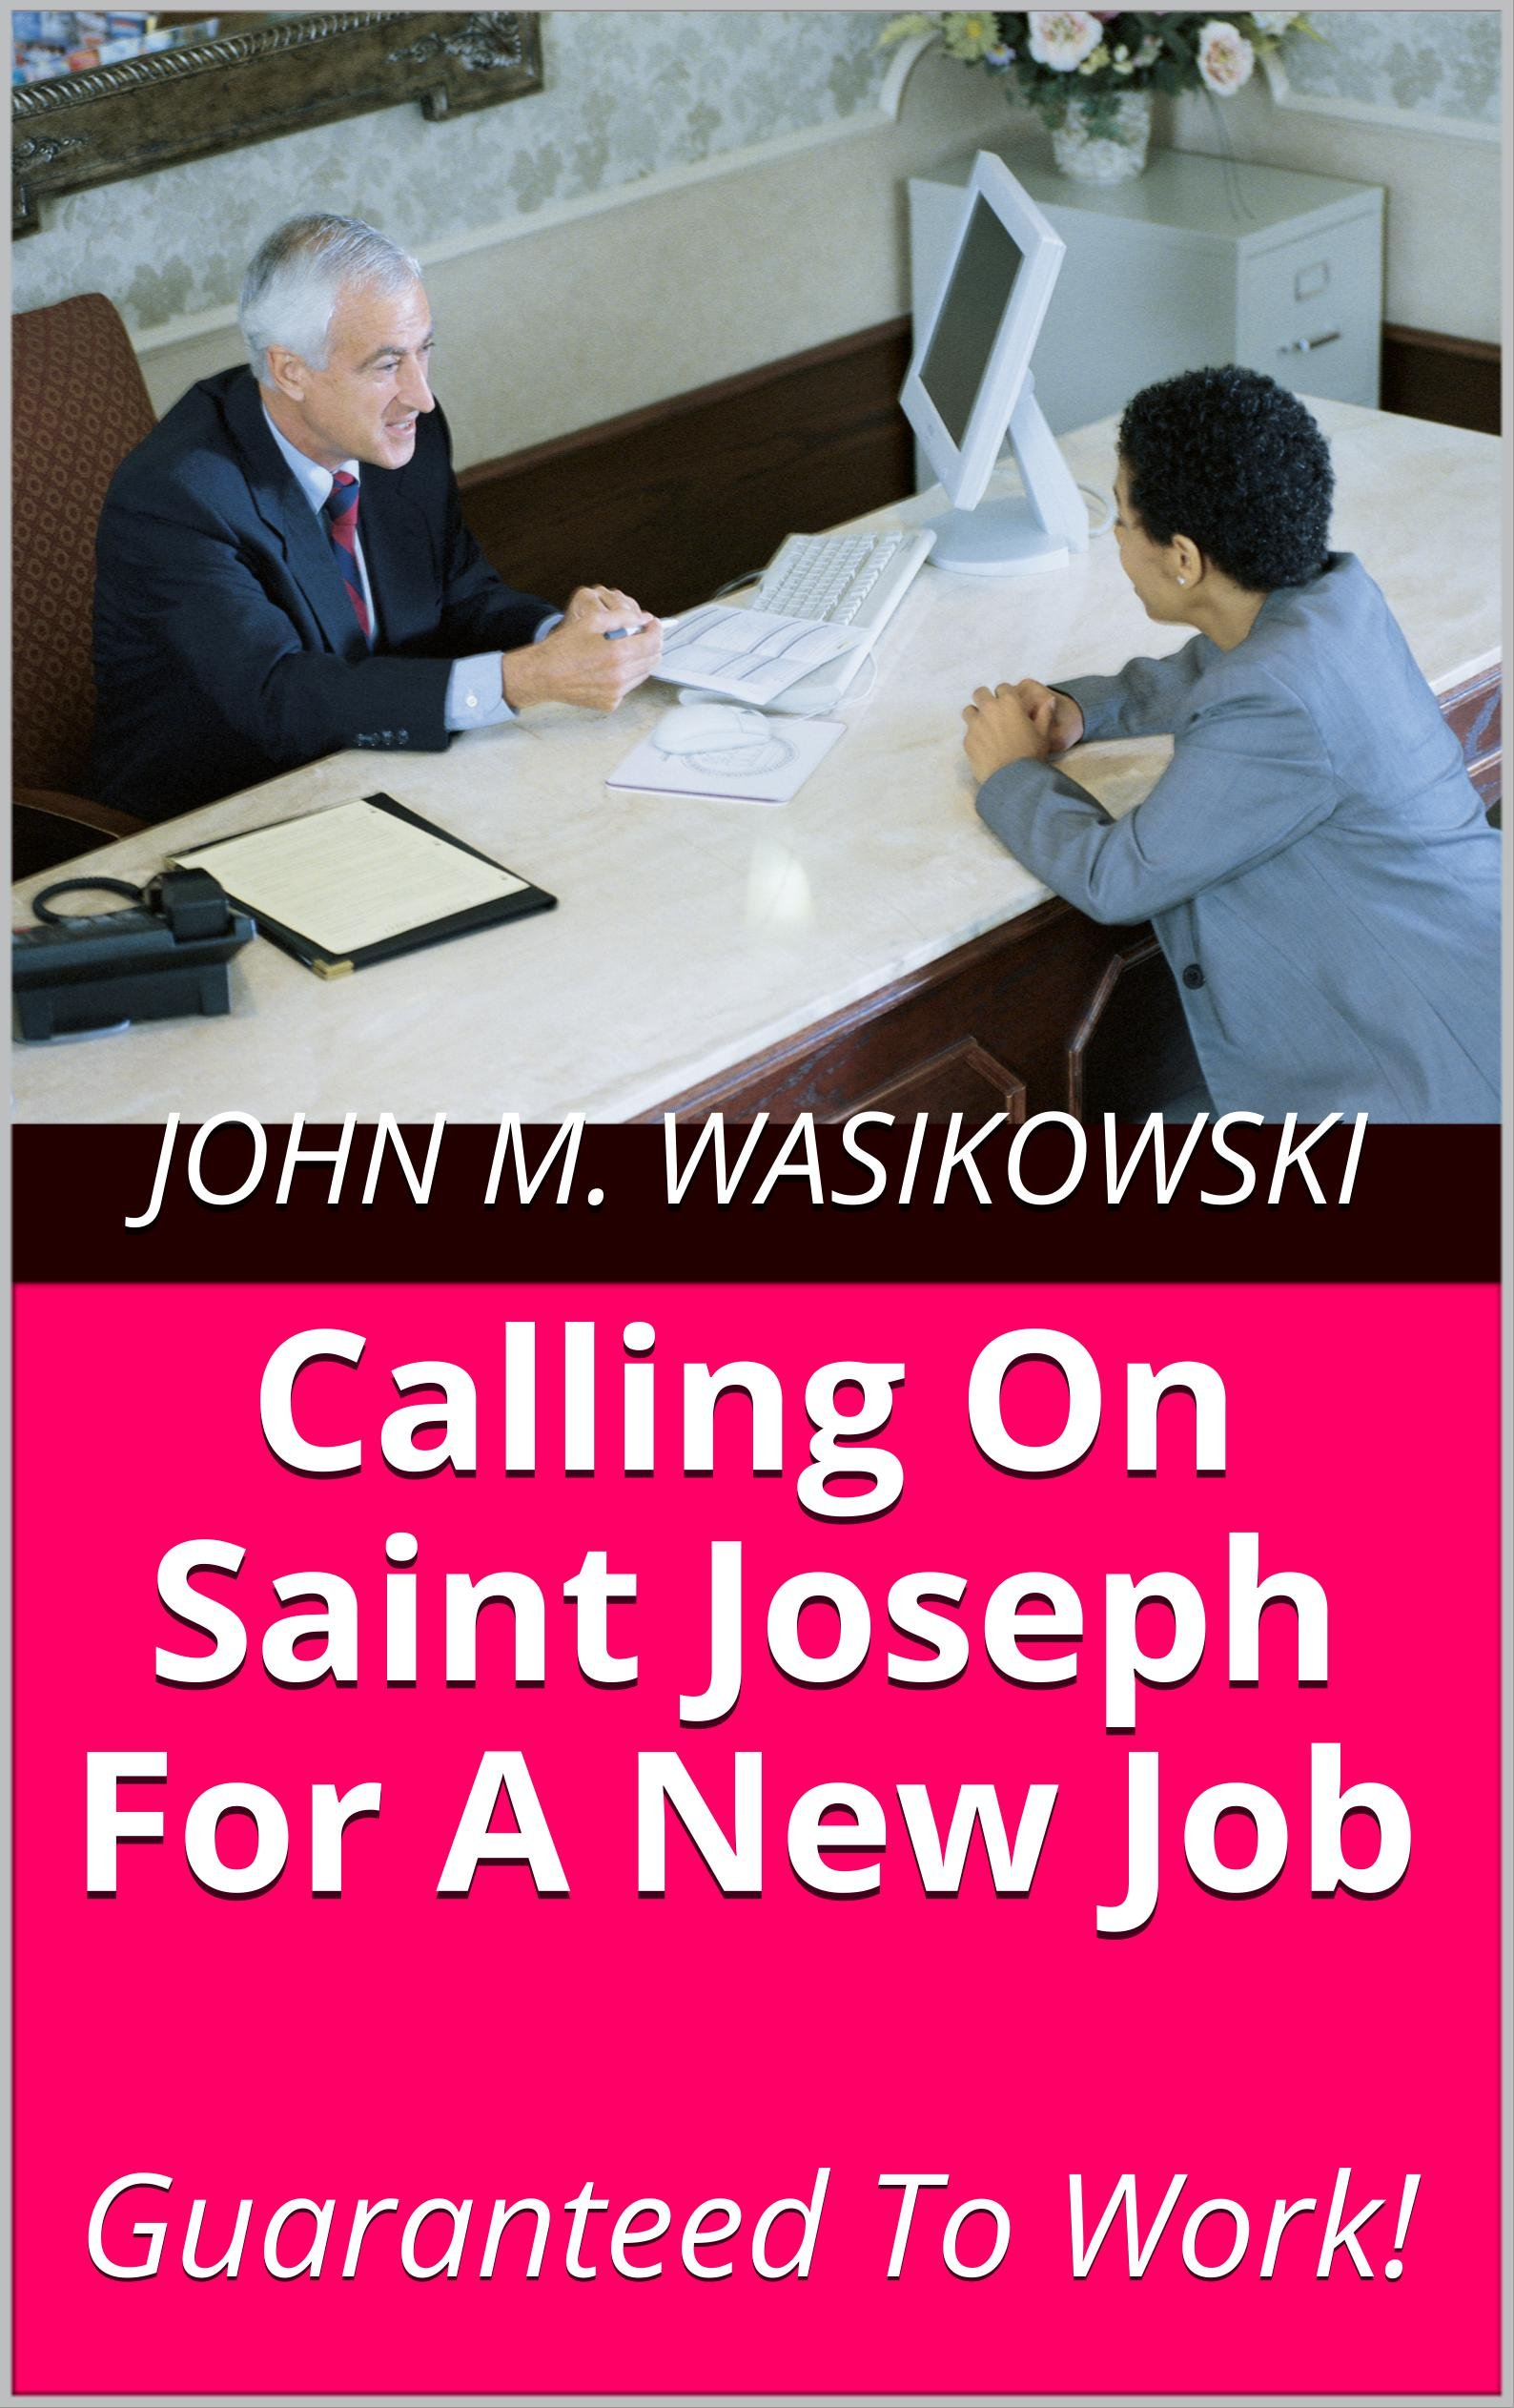 Calling On Saint Joseph For A New Job: Guaranteed To Work!